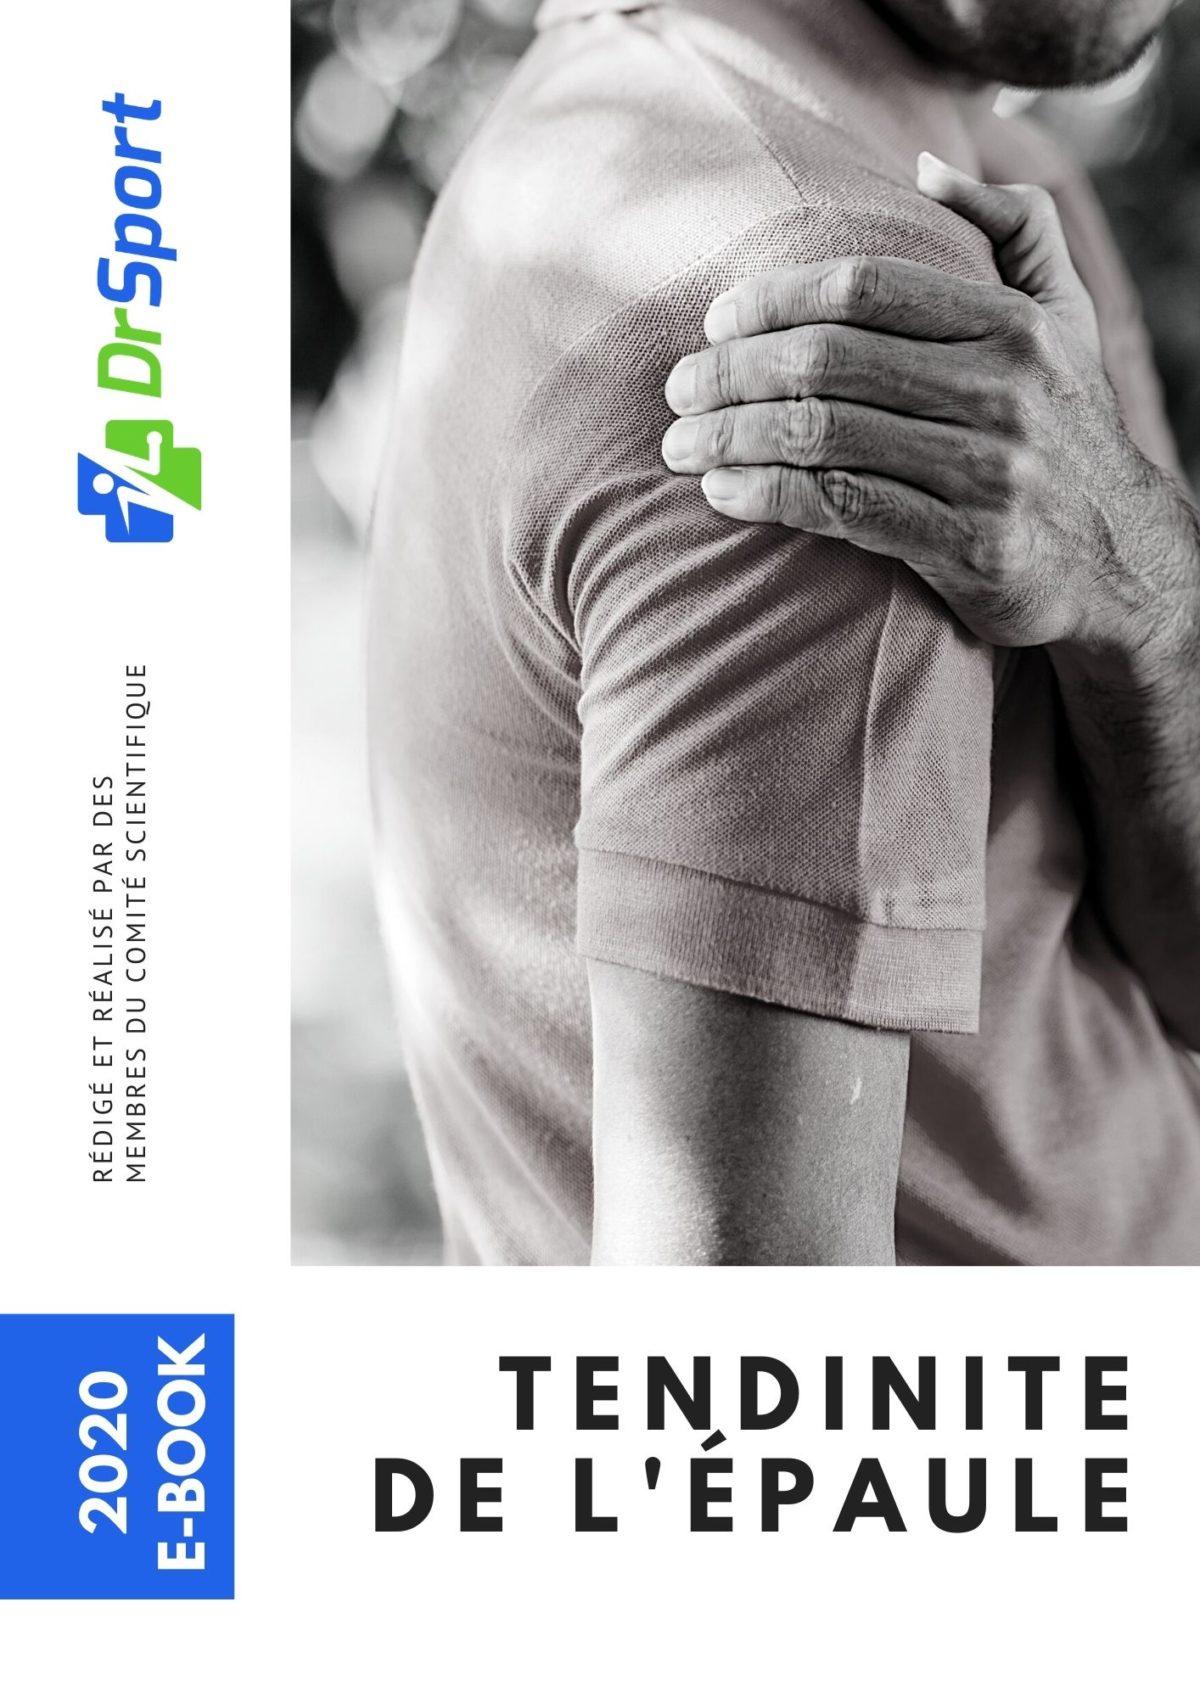 La tendinite de l'épaule – Ebook DrSport